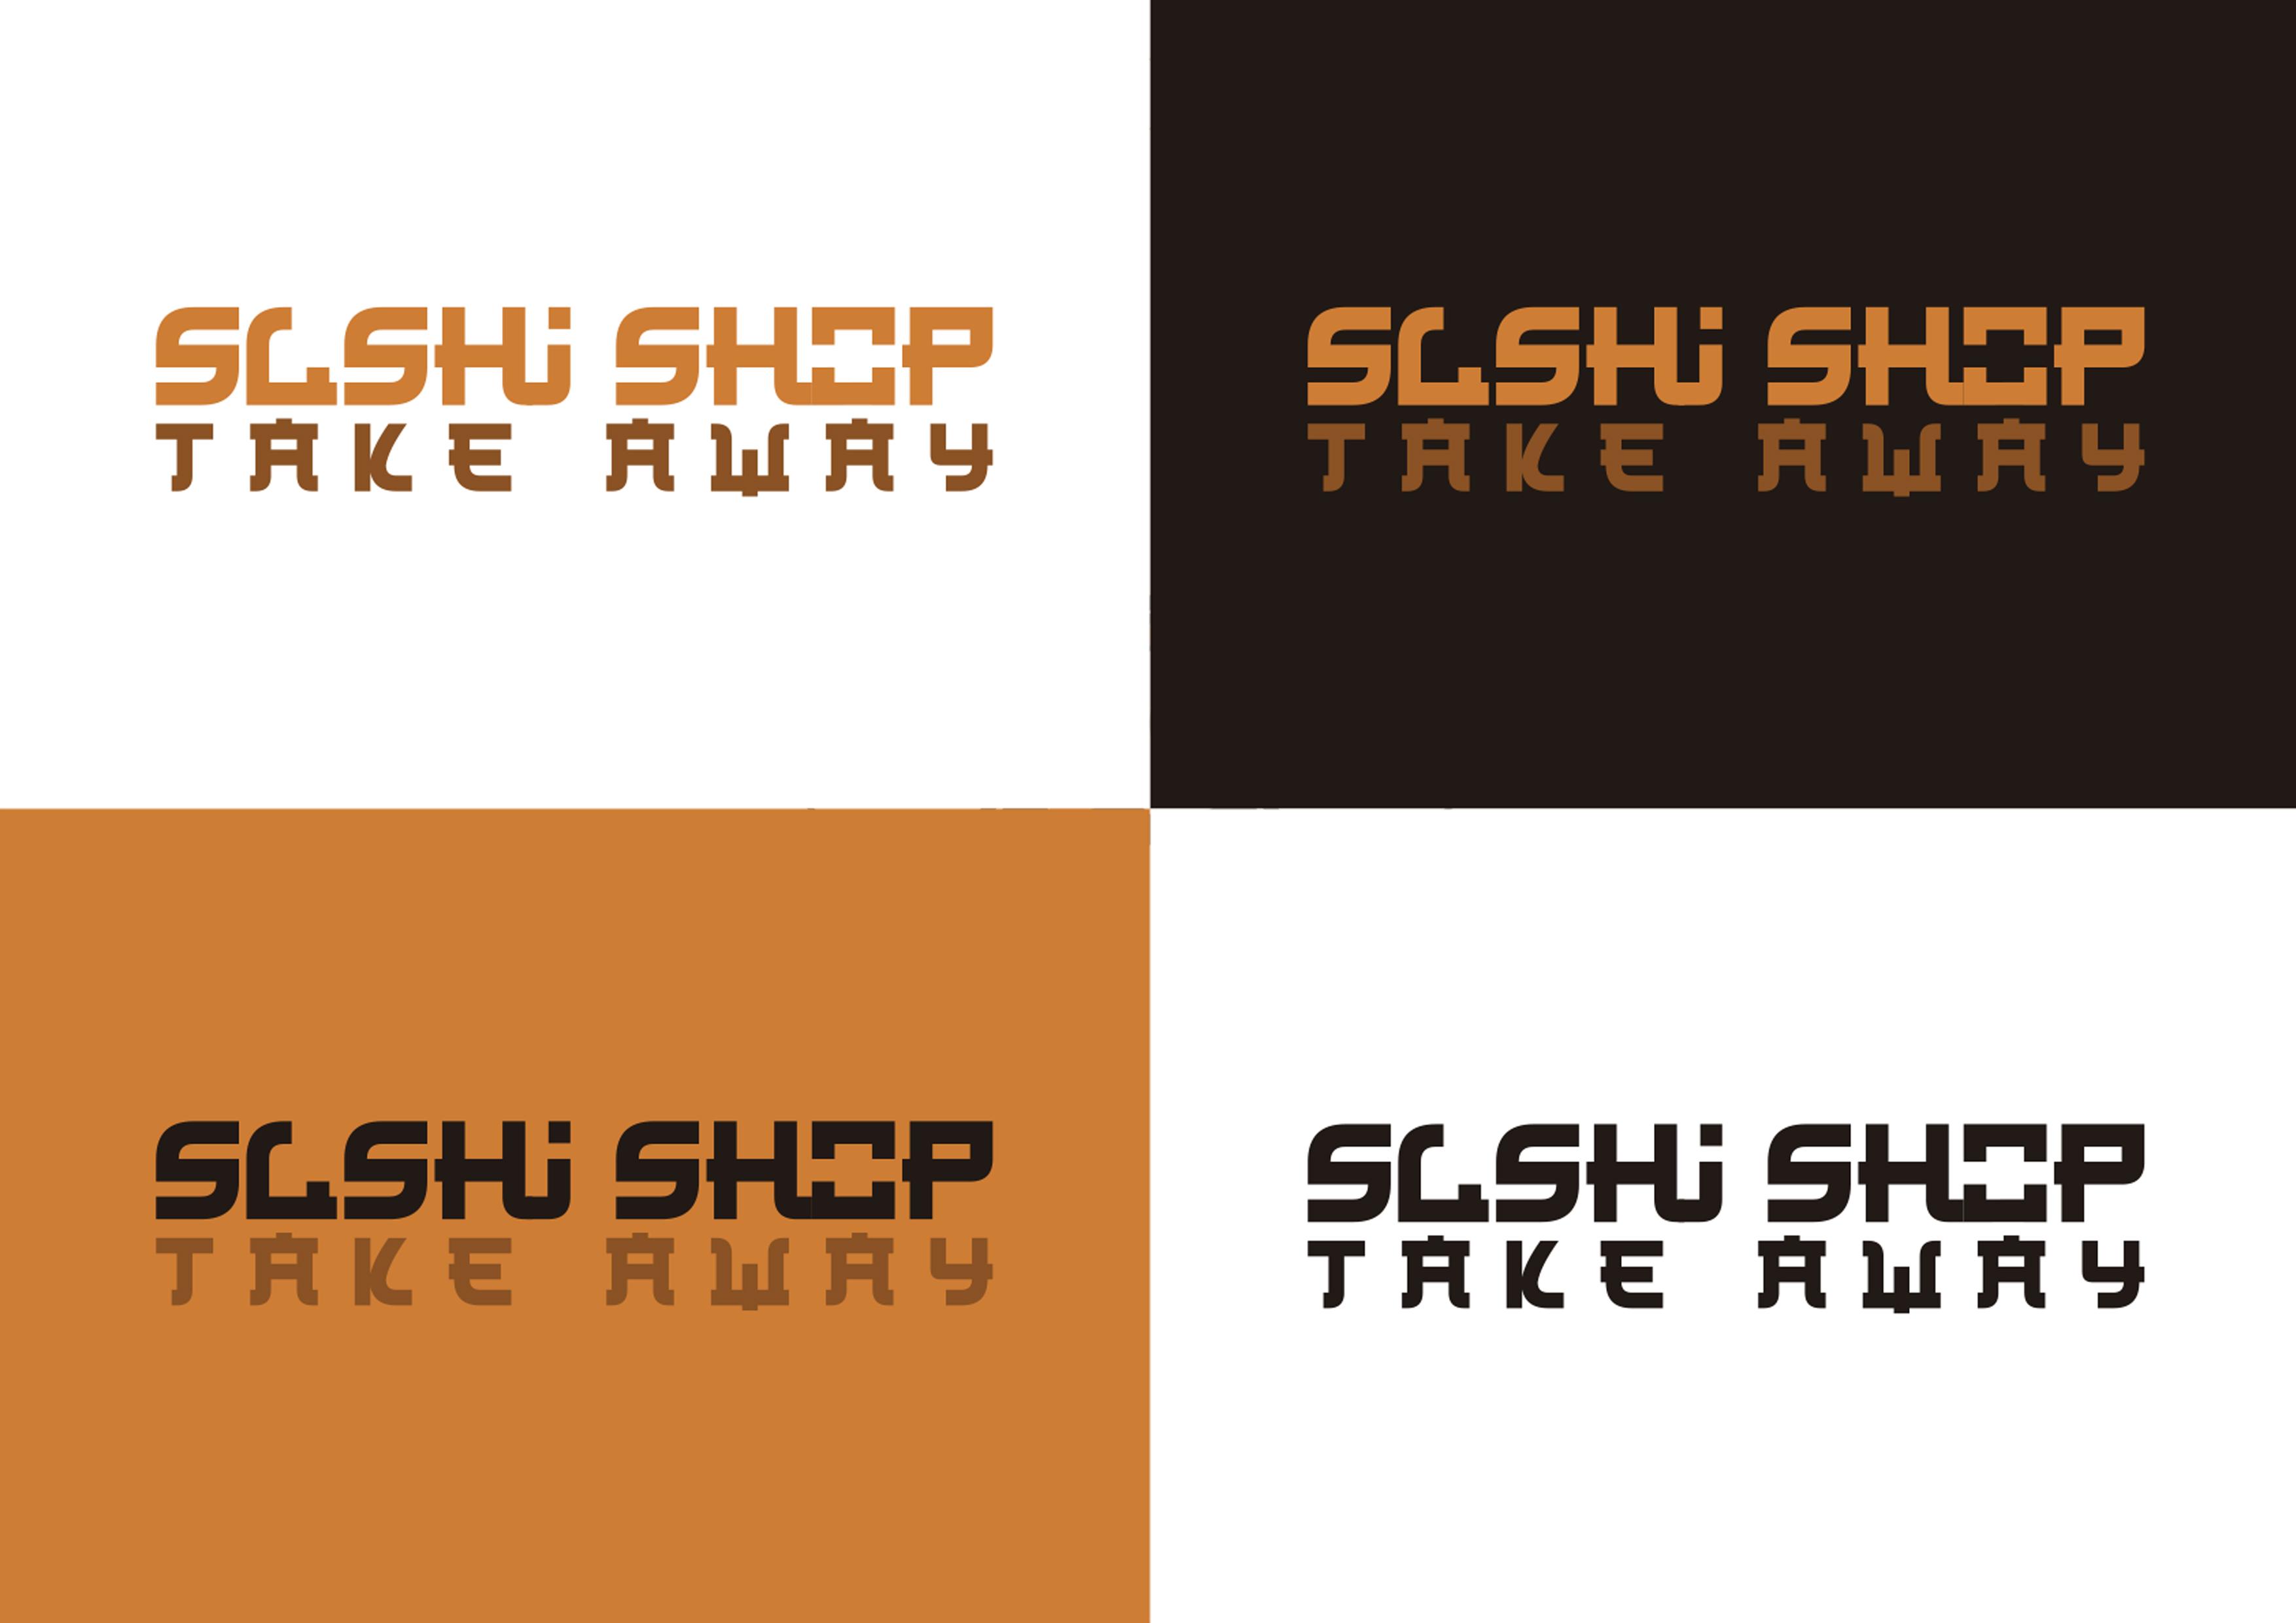 SUSHI SHOP TAKE AWAY CORES